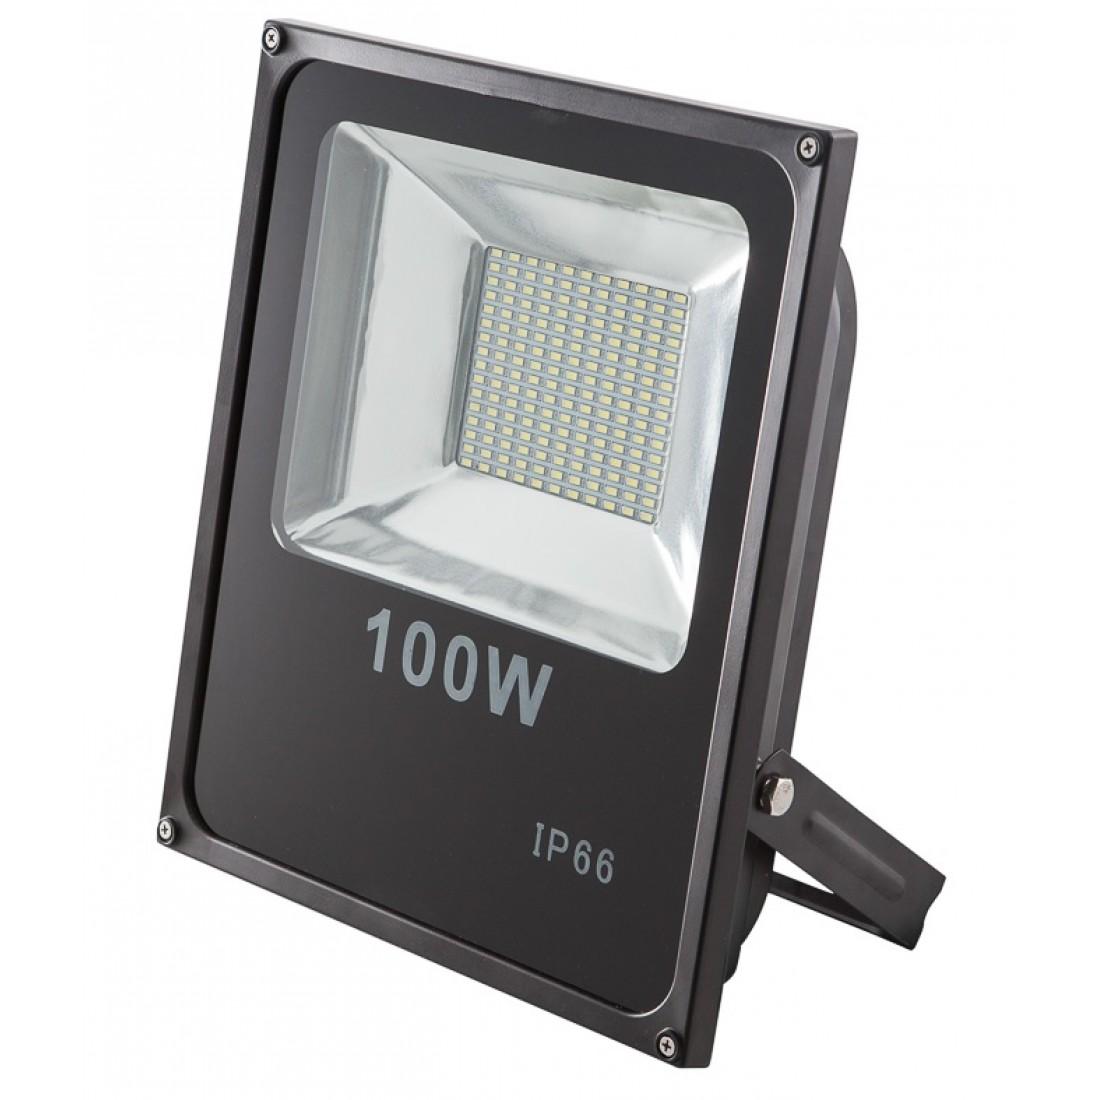 100w прожектор своими руками фото 135